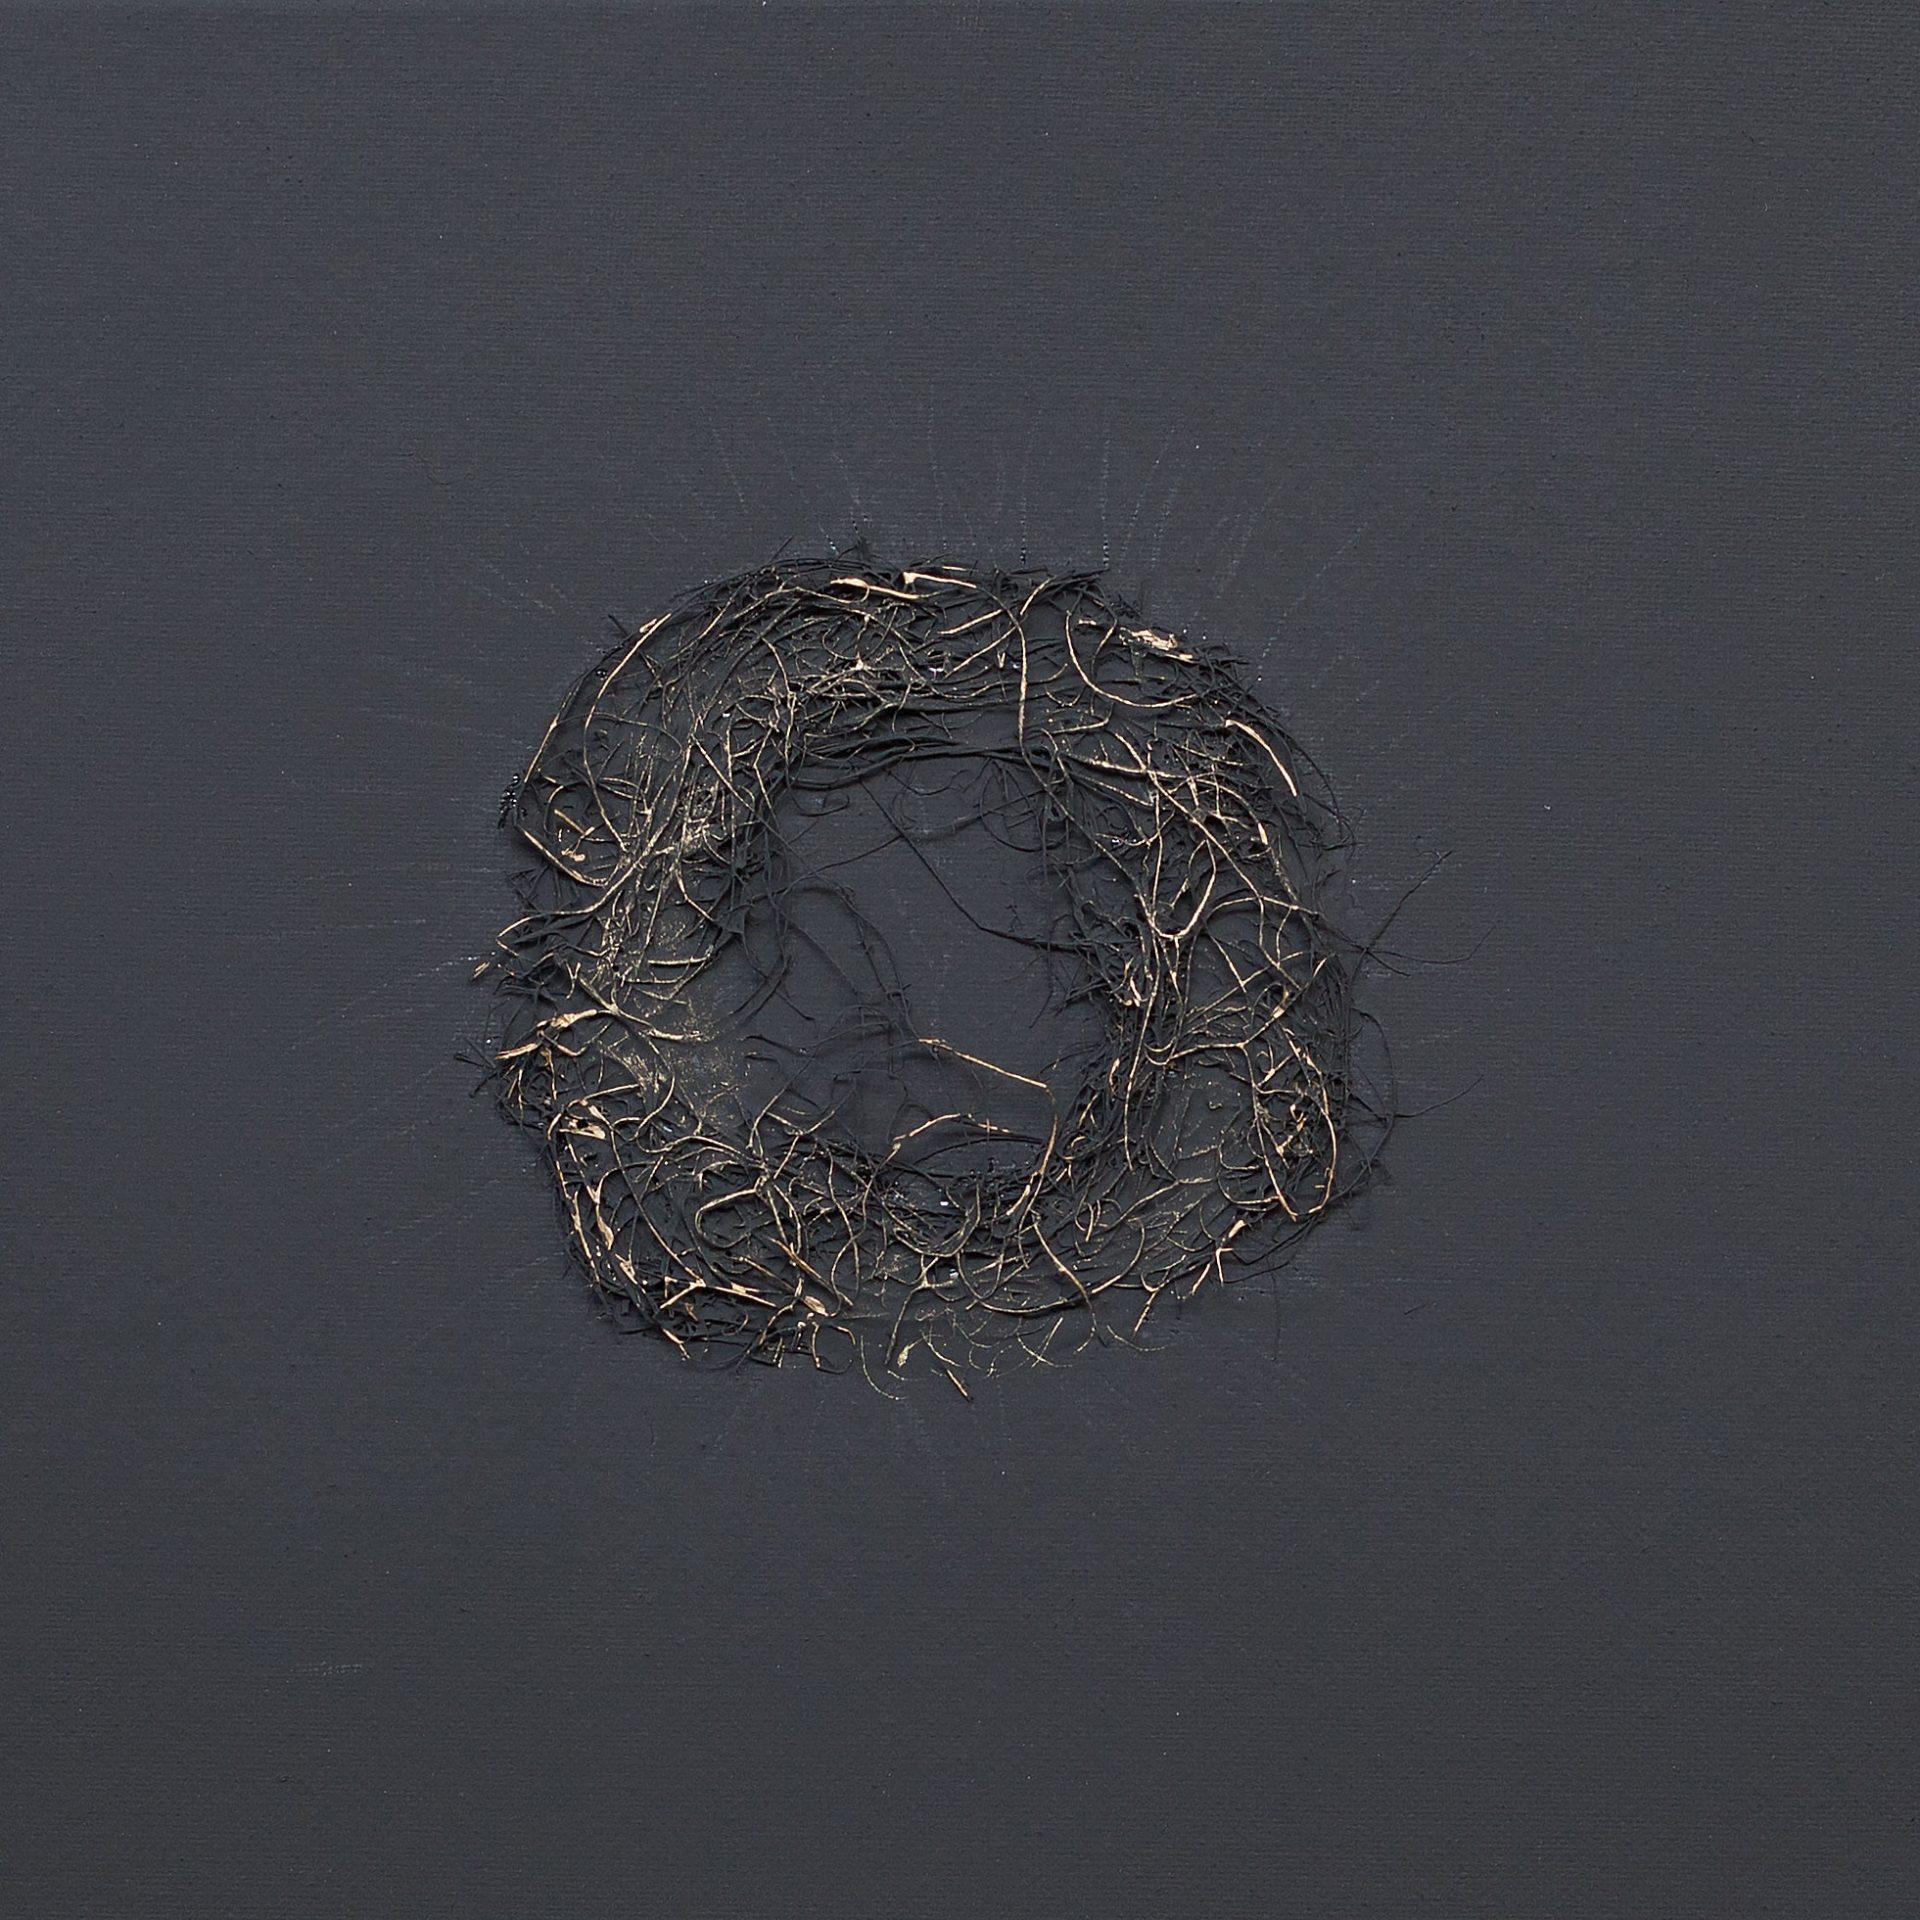 corona daurada sobre fons negre